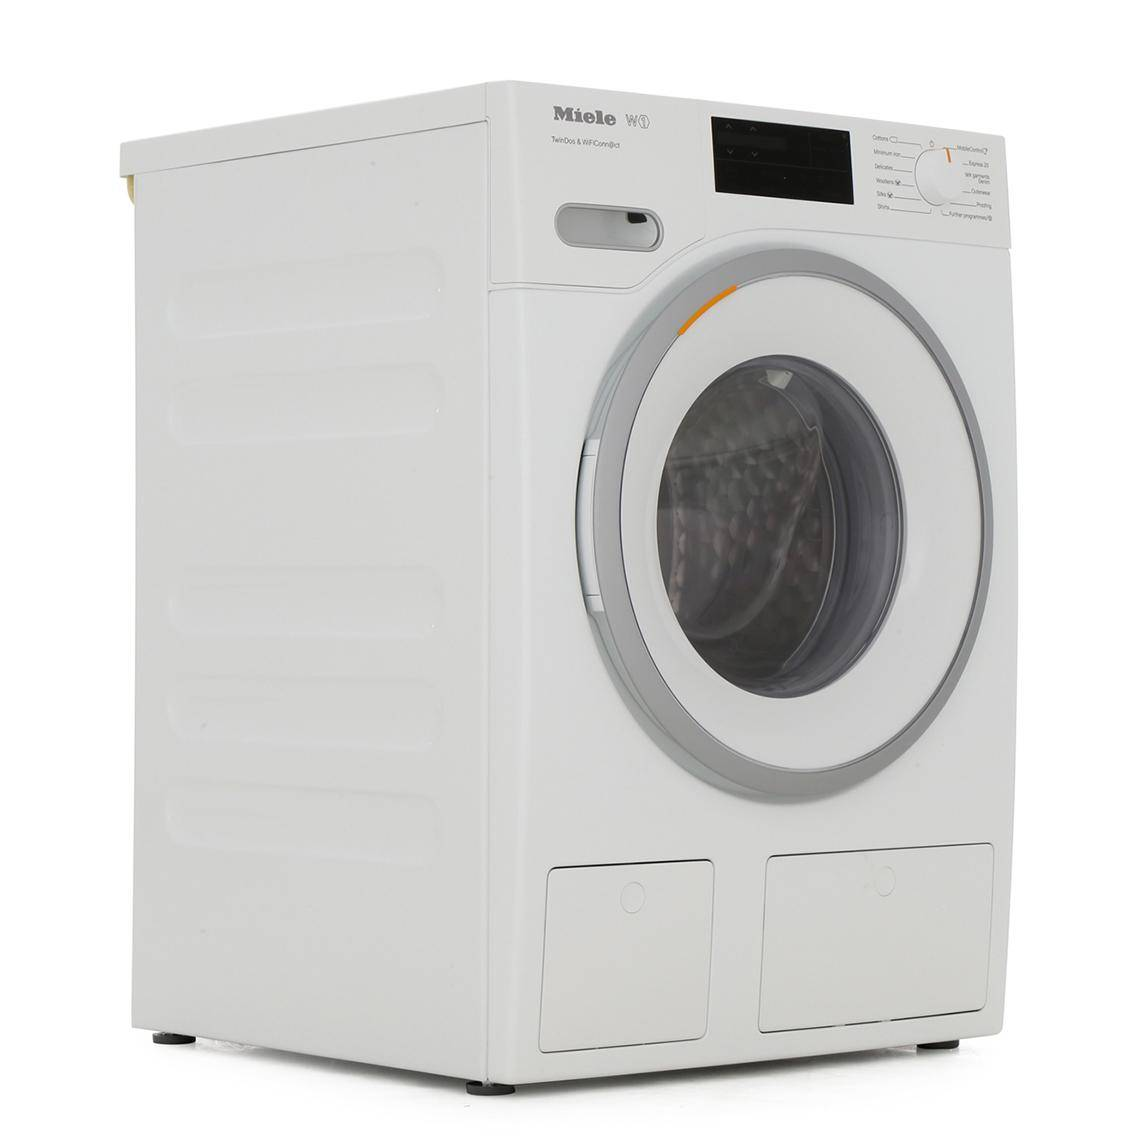 miele w1 whiteedition wwe660 twindos white washing machine